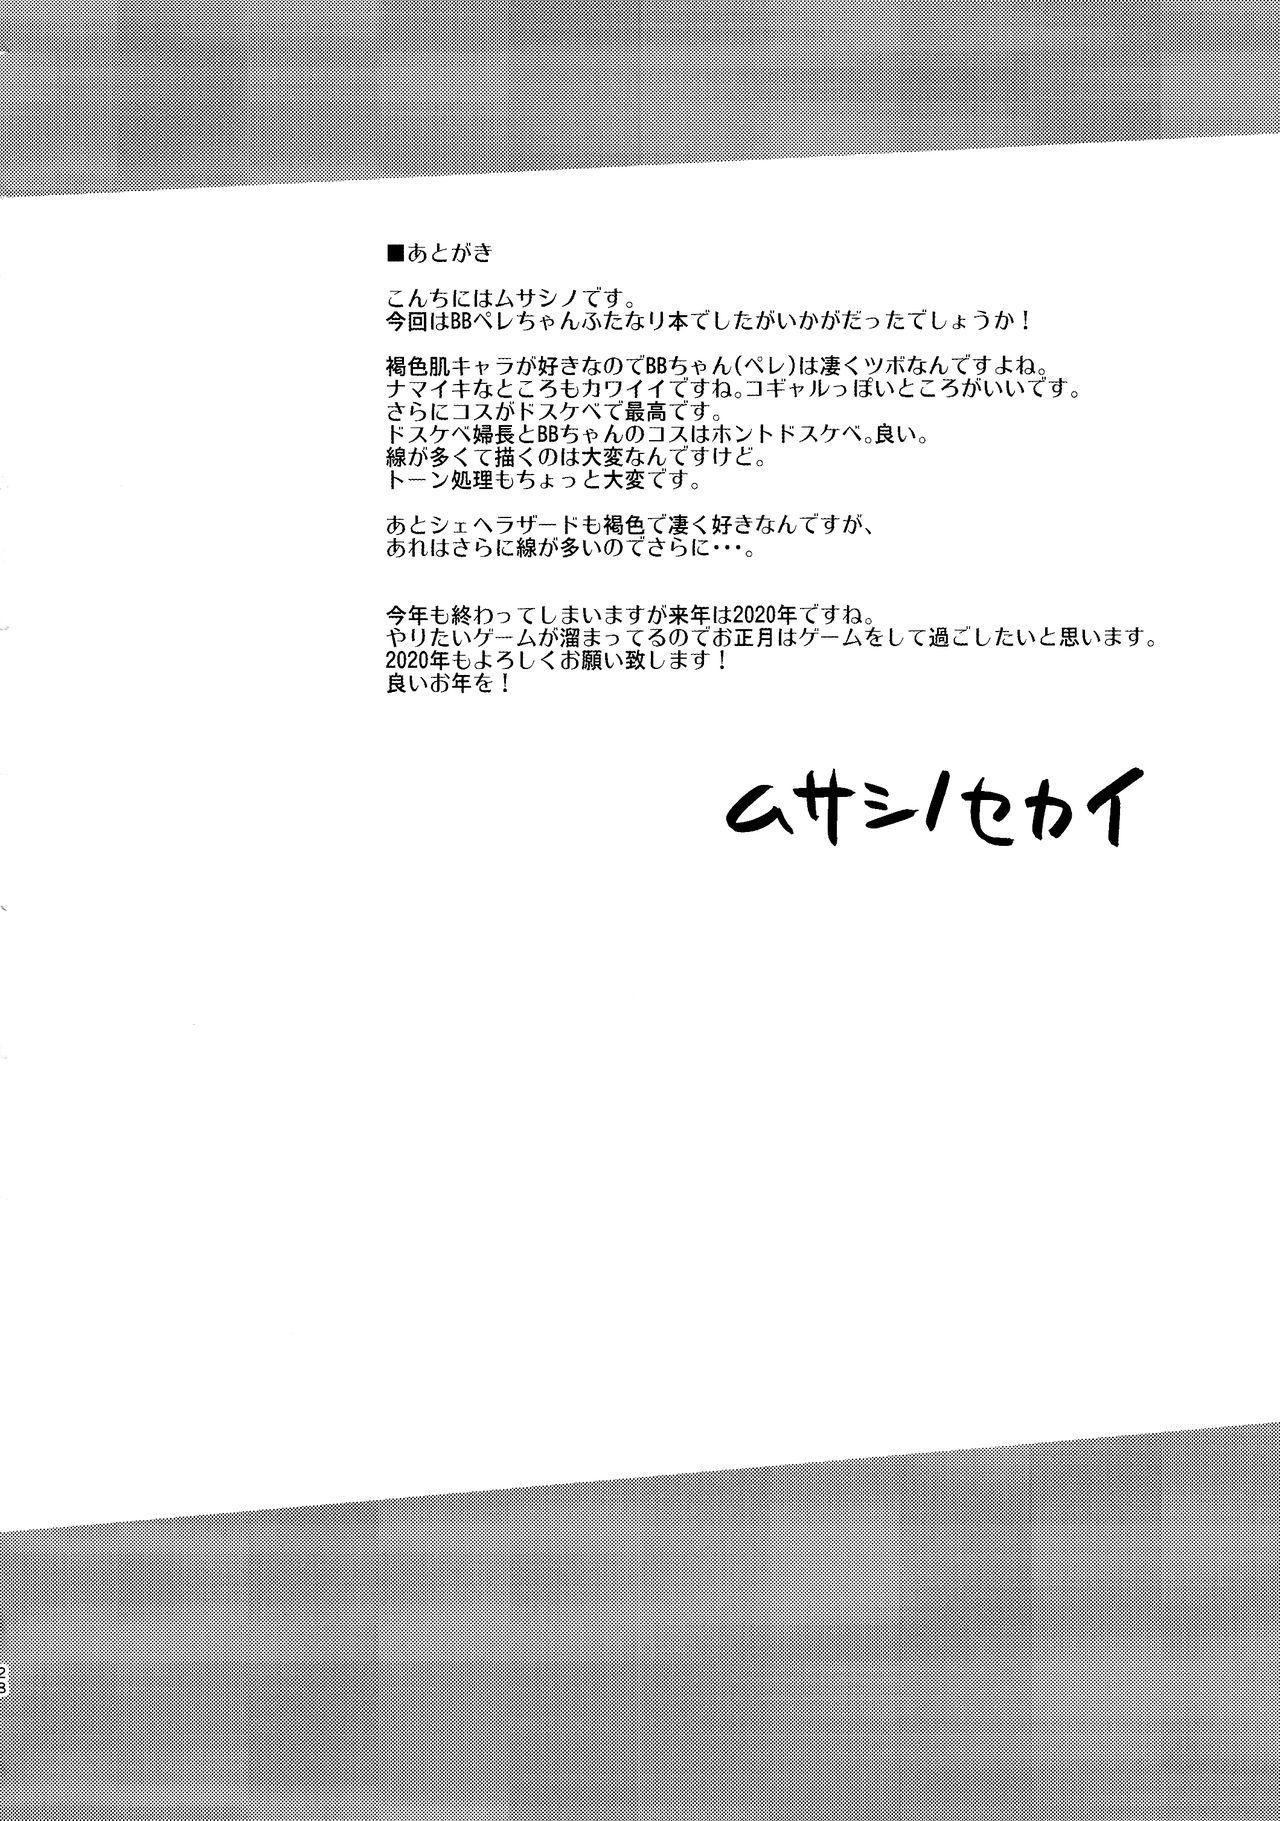 NAMAIKI GAL BITCH FUTANARIX 27